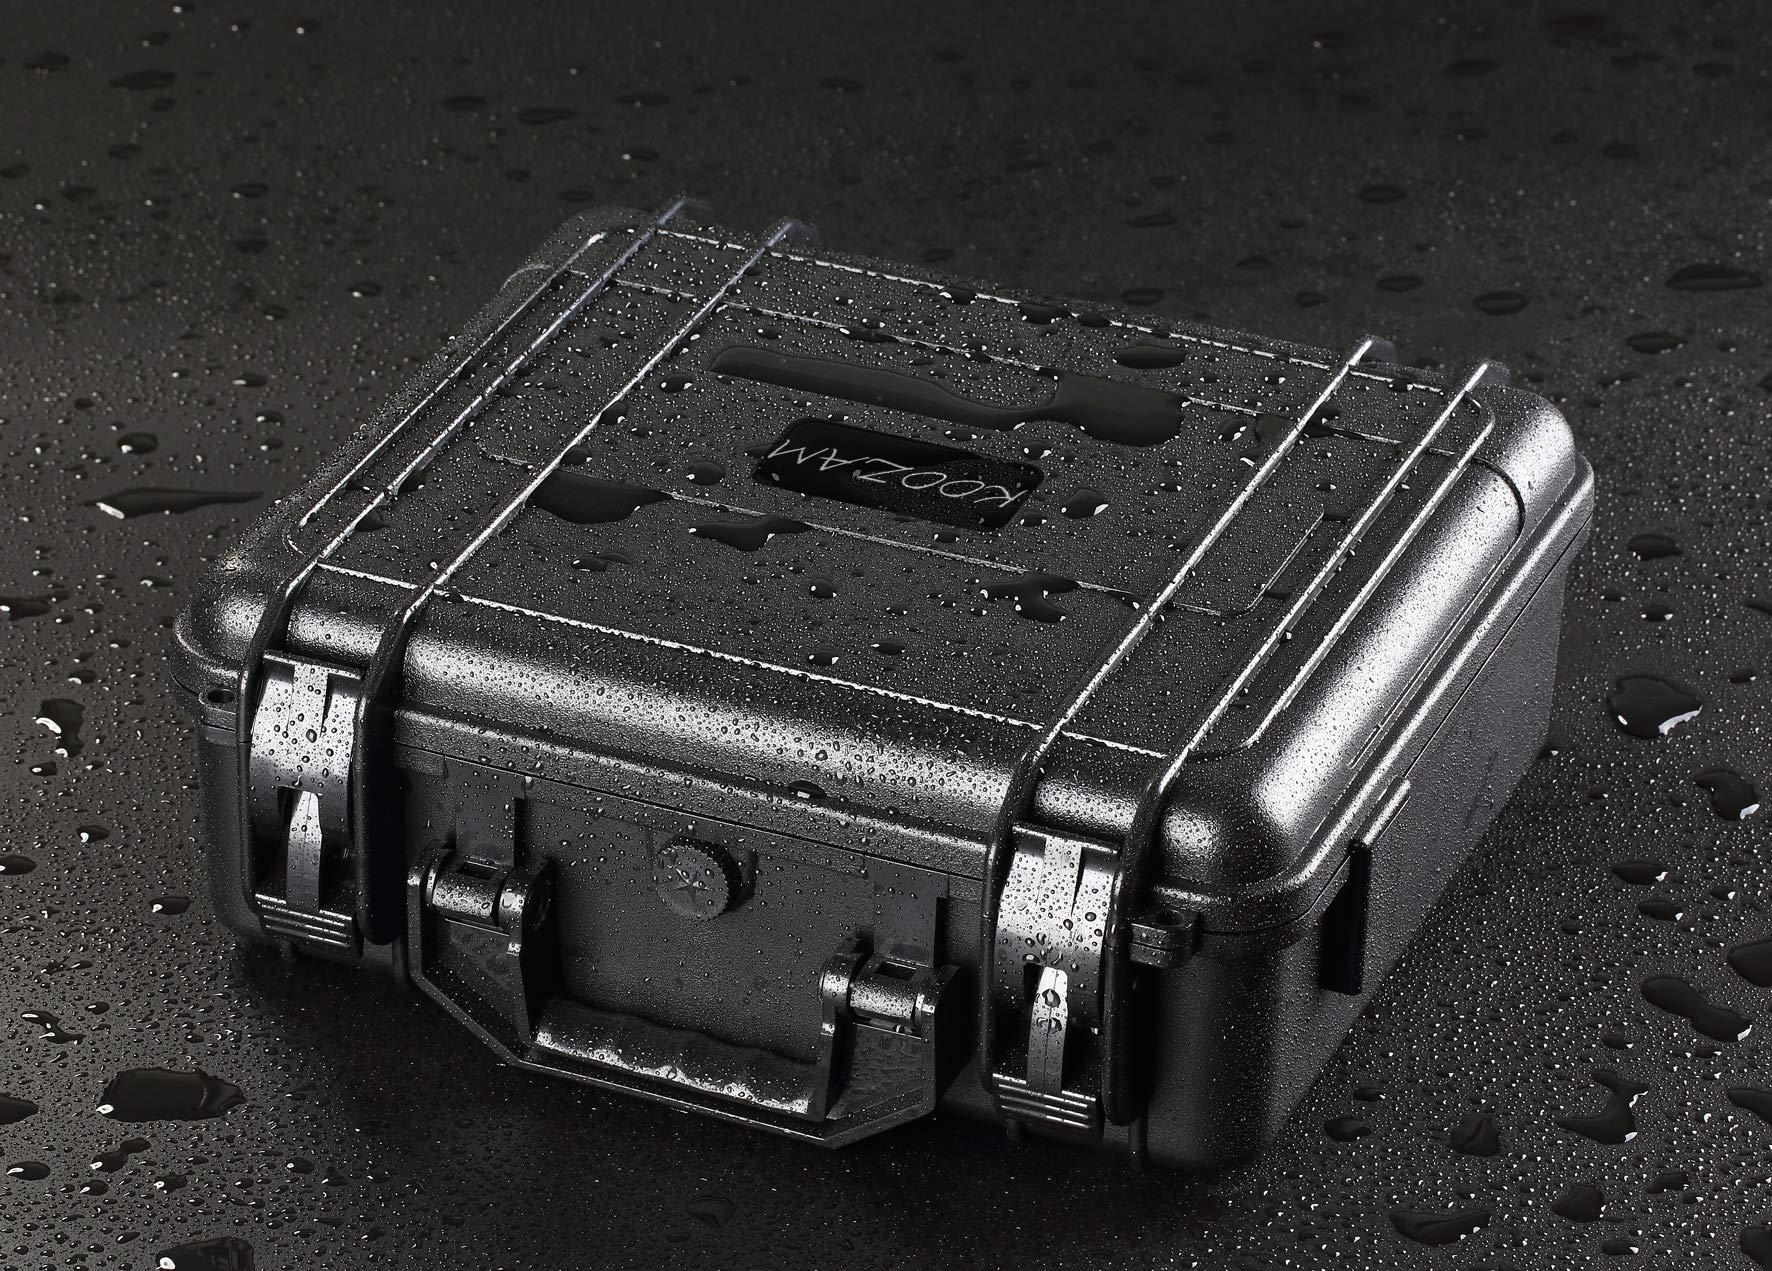 Koozam DJI Mavic 2 Waterproof Hard Case, with Smart Controller, for Mavic 2 Pro and Zoom Drones, Waterproof and Shockproof (for Mavic 2 with Smart Controller) by Koozam (Image #9)